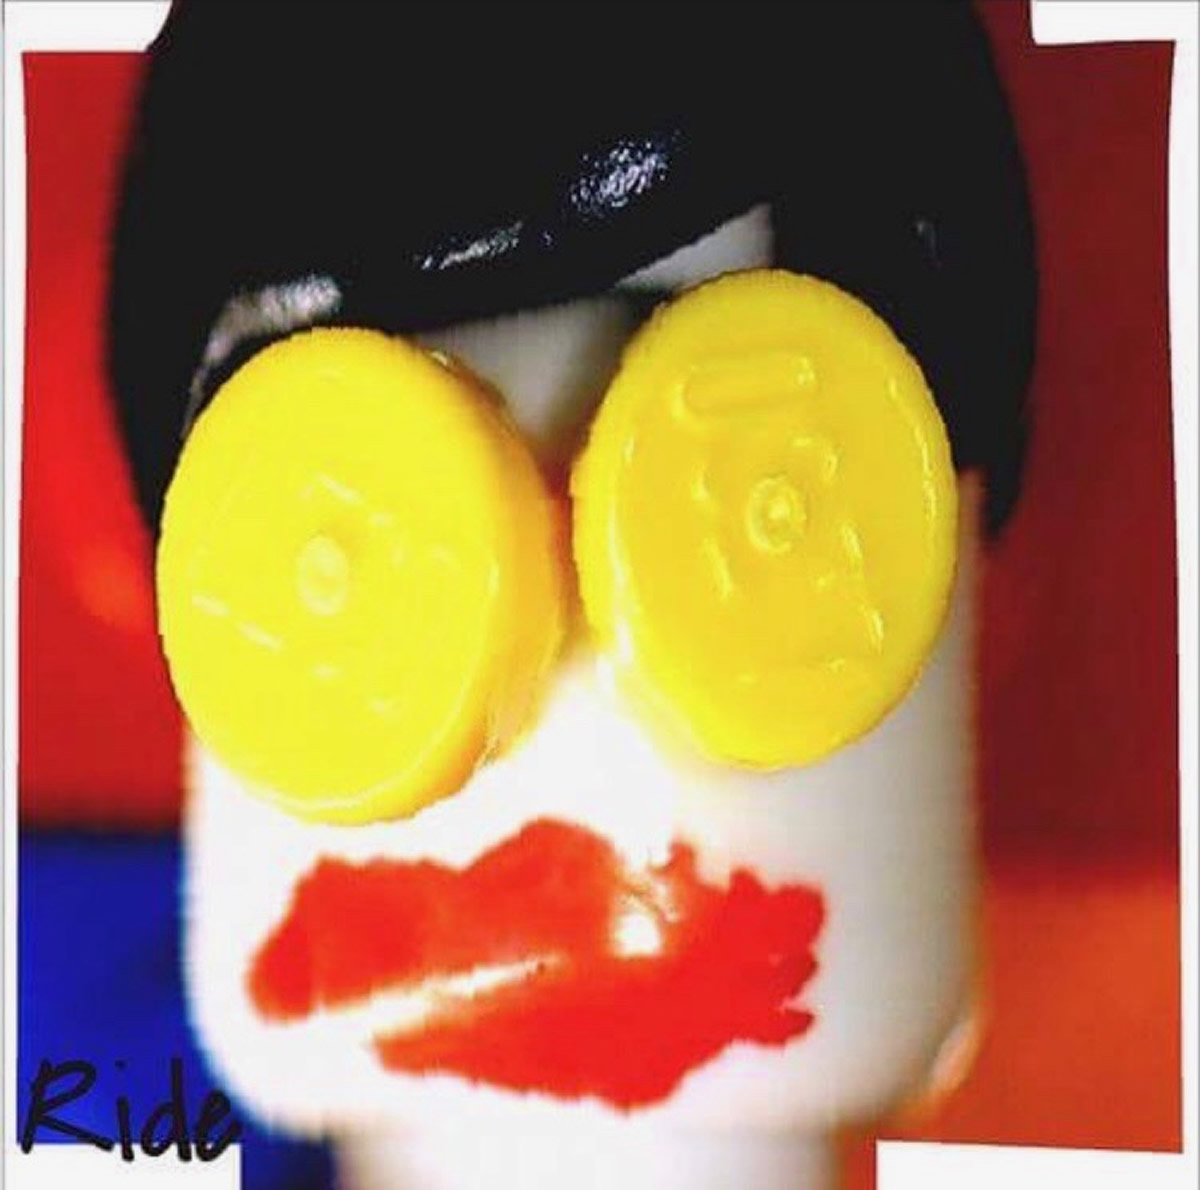 Going Blank Again in Lego